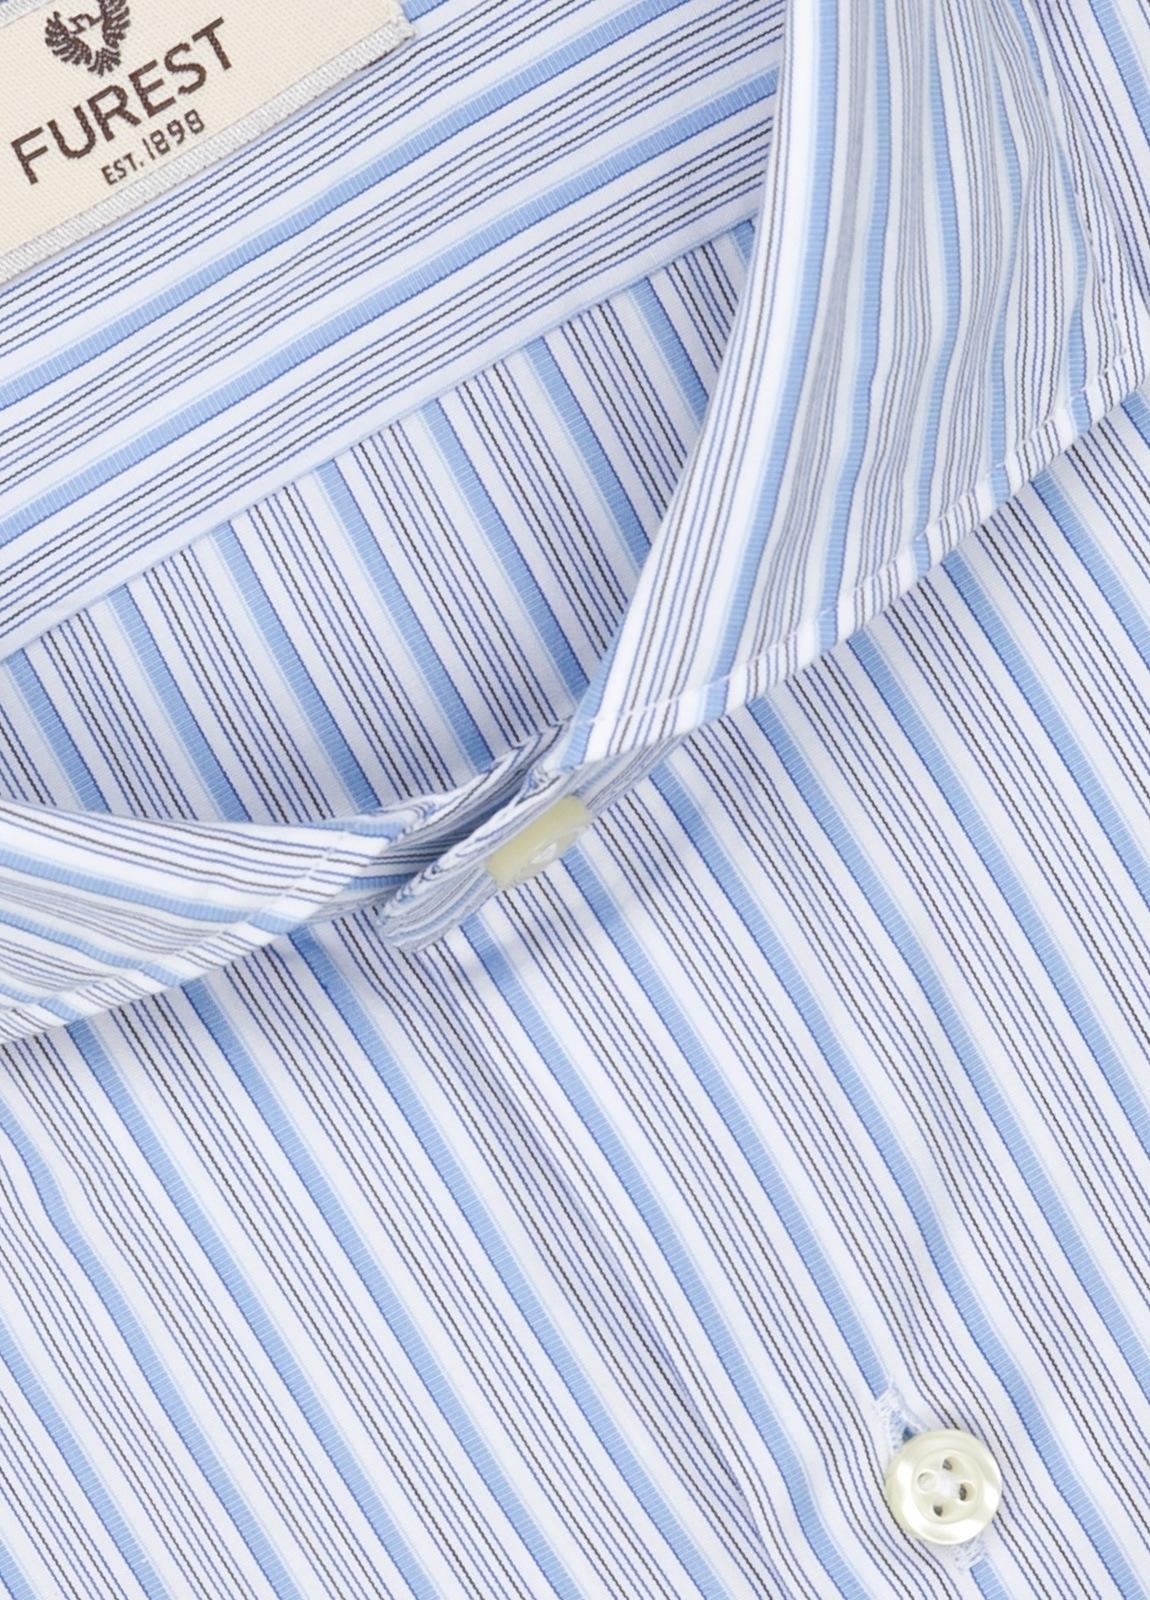 Camisa Leisure Wear SLIM FIT Modelo CAPRI, rayas celeste, gris, 100% Algodón. - Ítem1